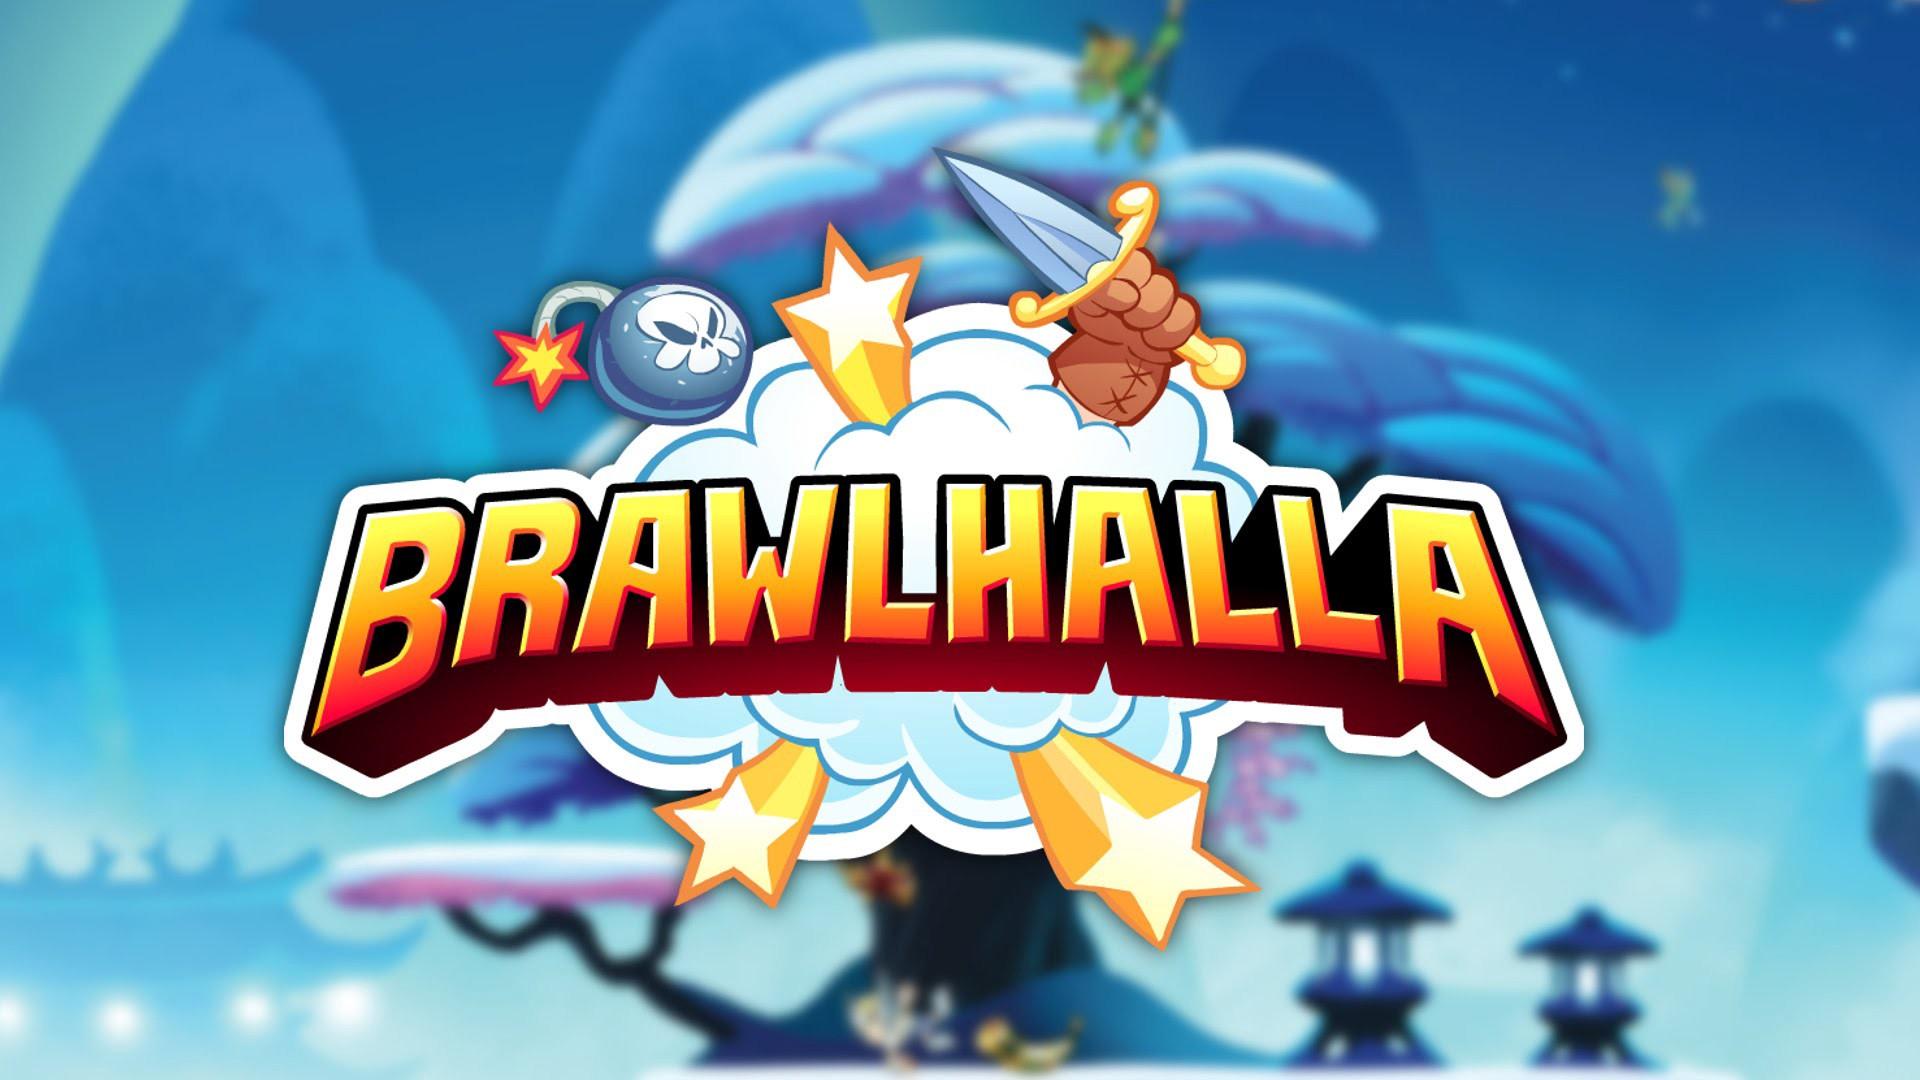 Brawlhalla wallpaper 2